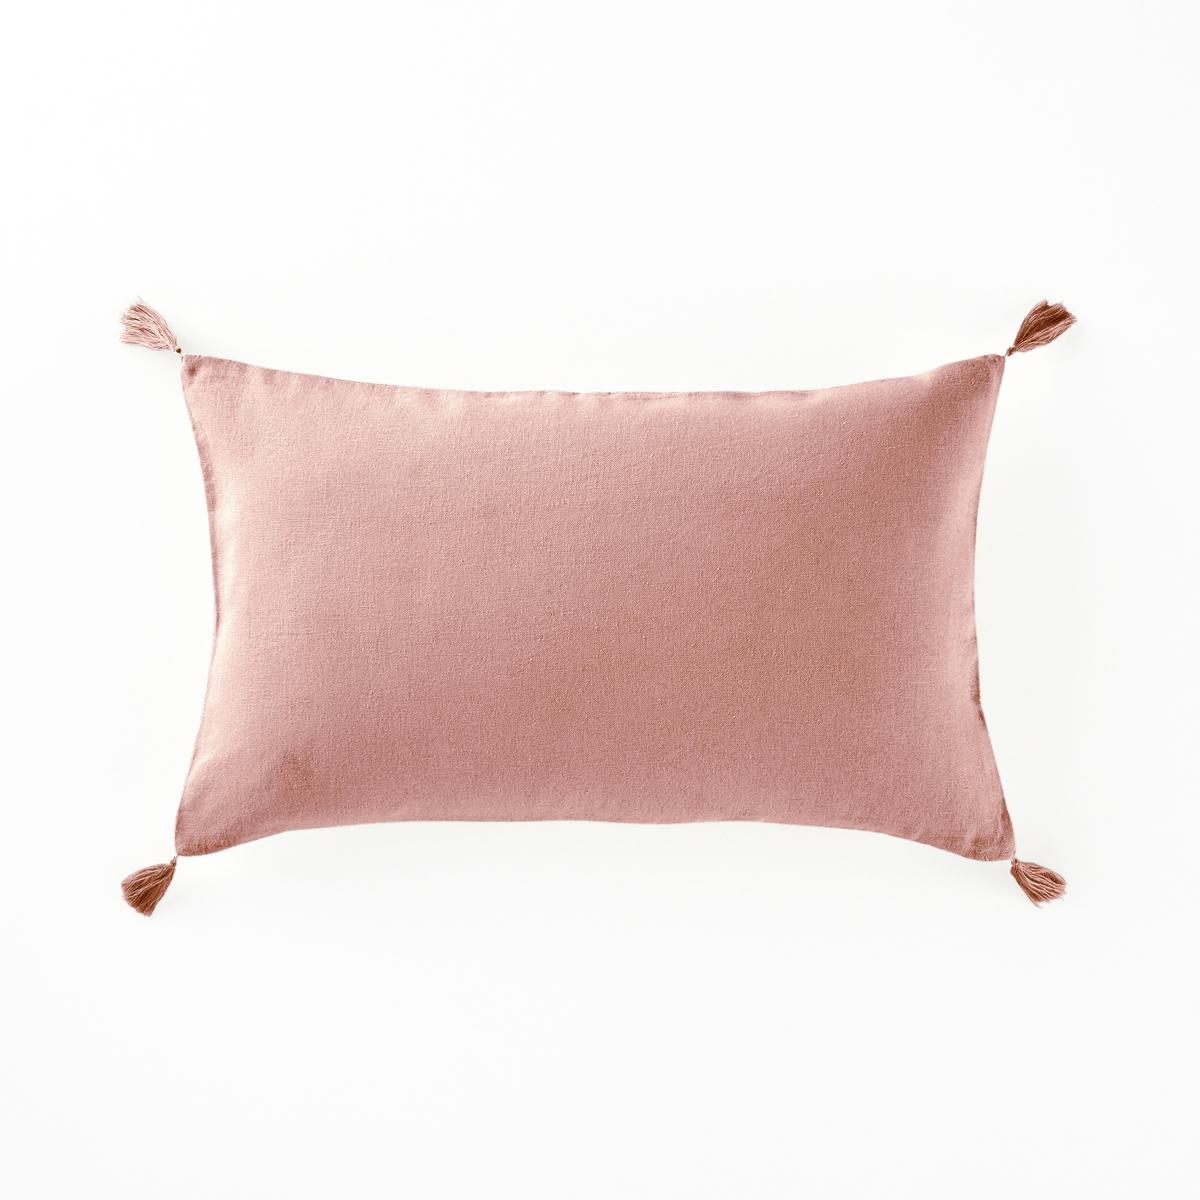 Чехол La Redoute На подушку из льна и вискозы ODORIE 50 x 30 см розовый брюки широкие 7 8 из льна и вискозы